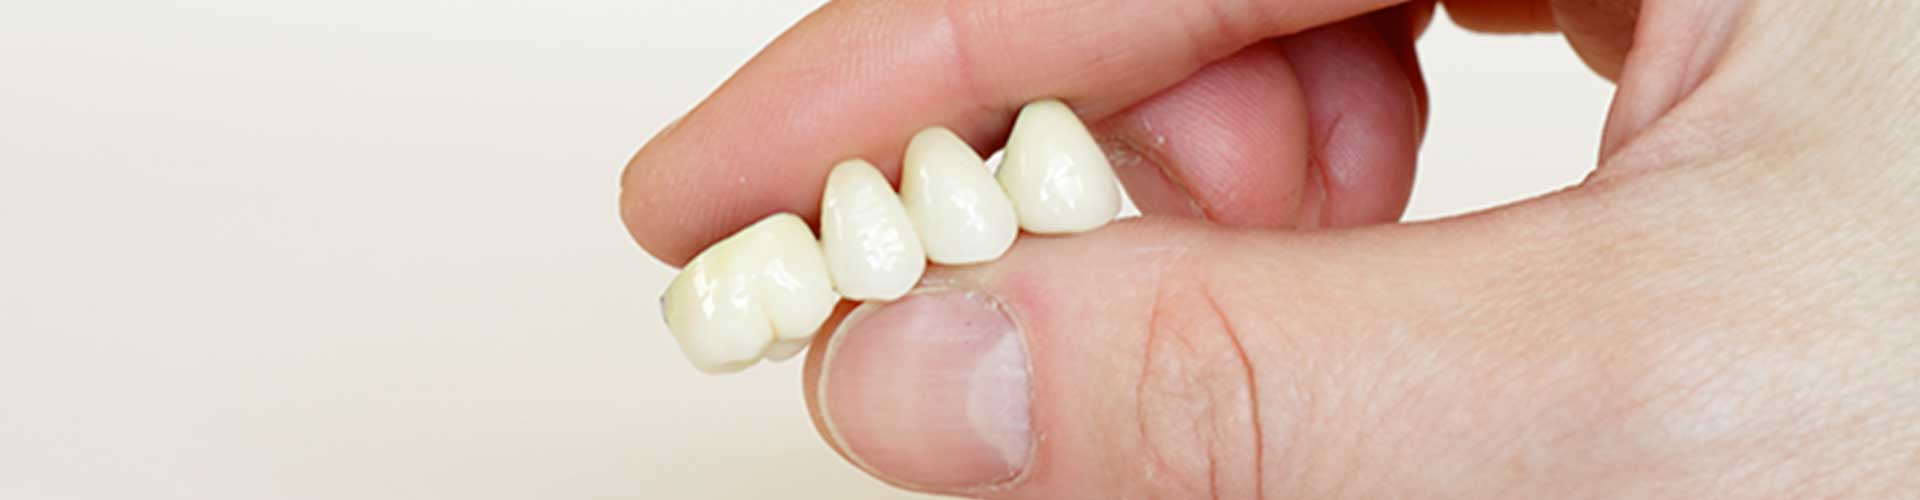 Dental Bridge | Tooth Suite Family Dentistry | General Dentist | Lloydminster